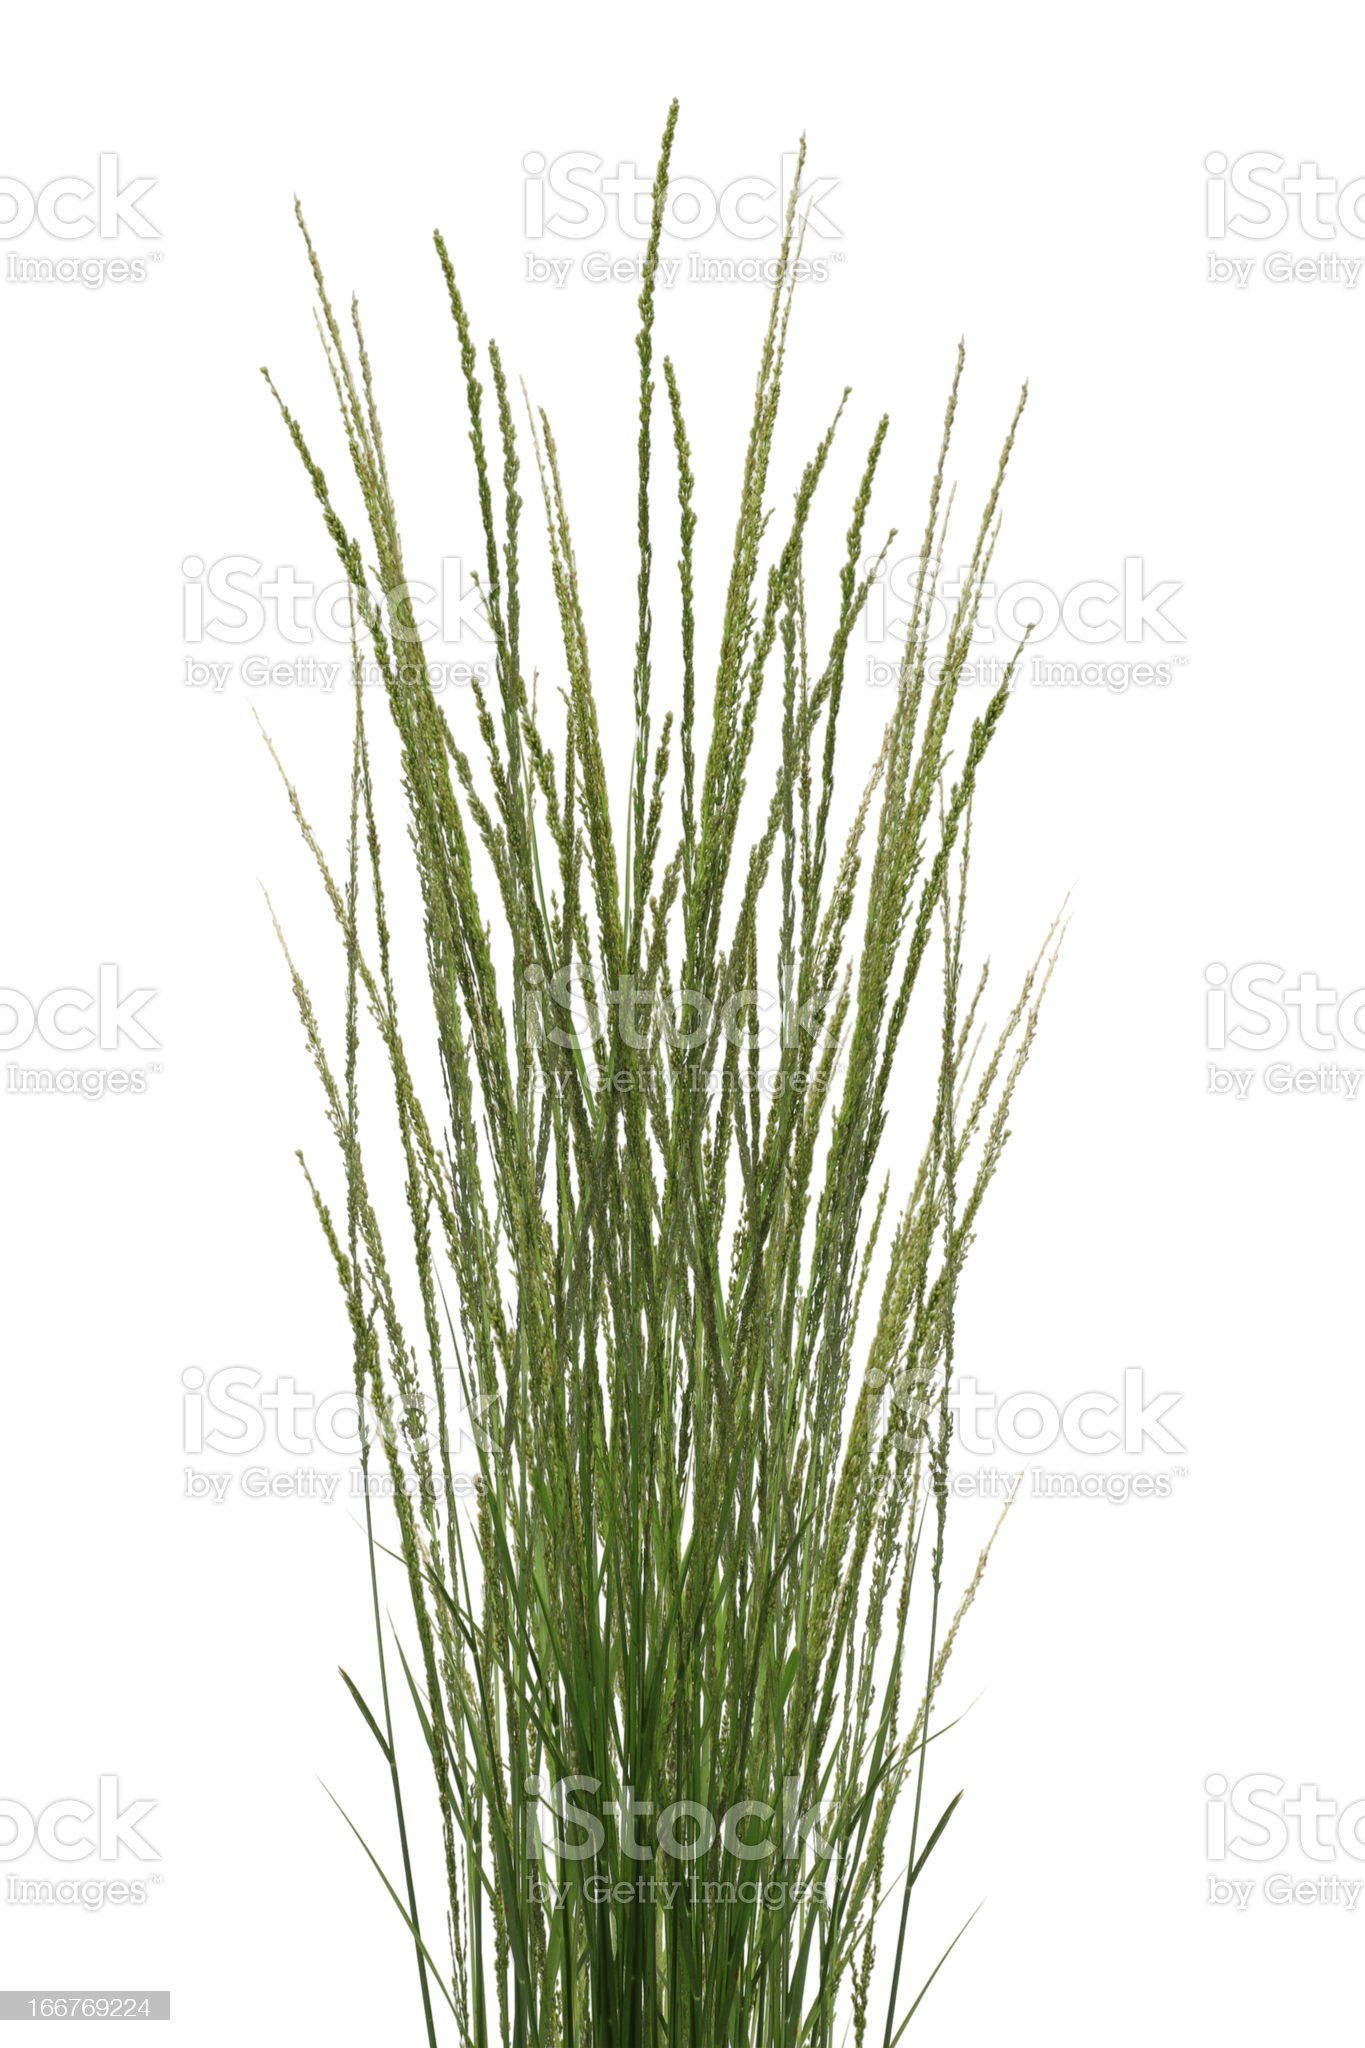 Tropical Grass Stalks royalty-free stock photo